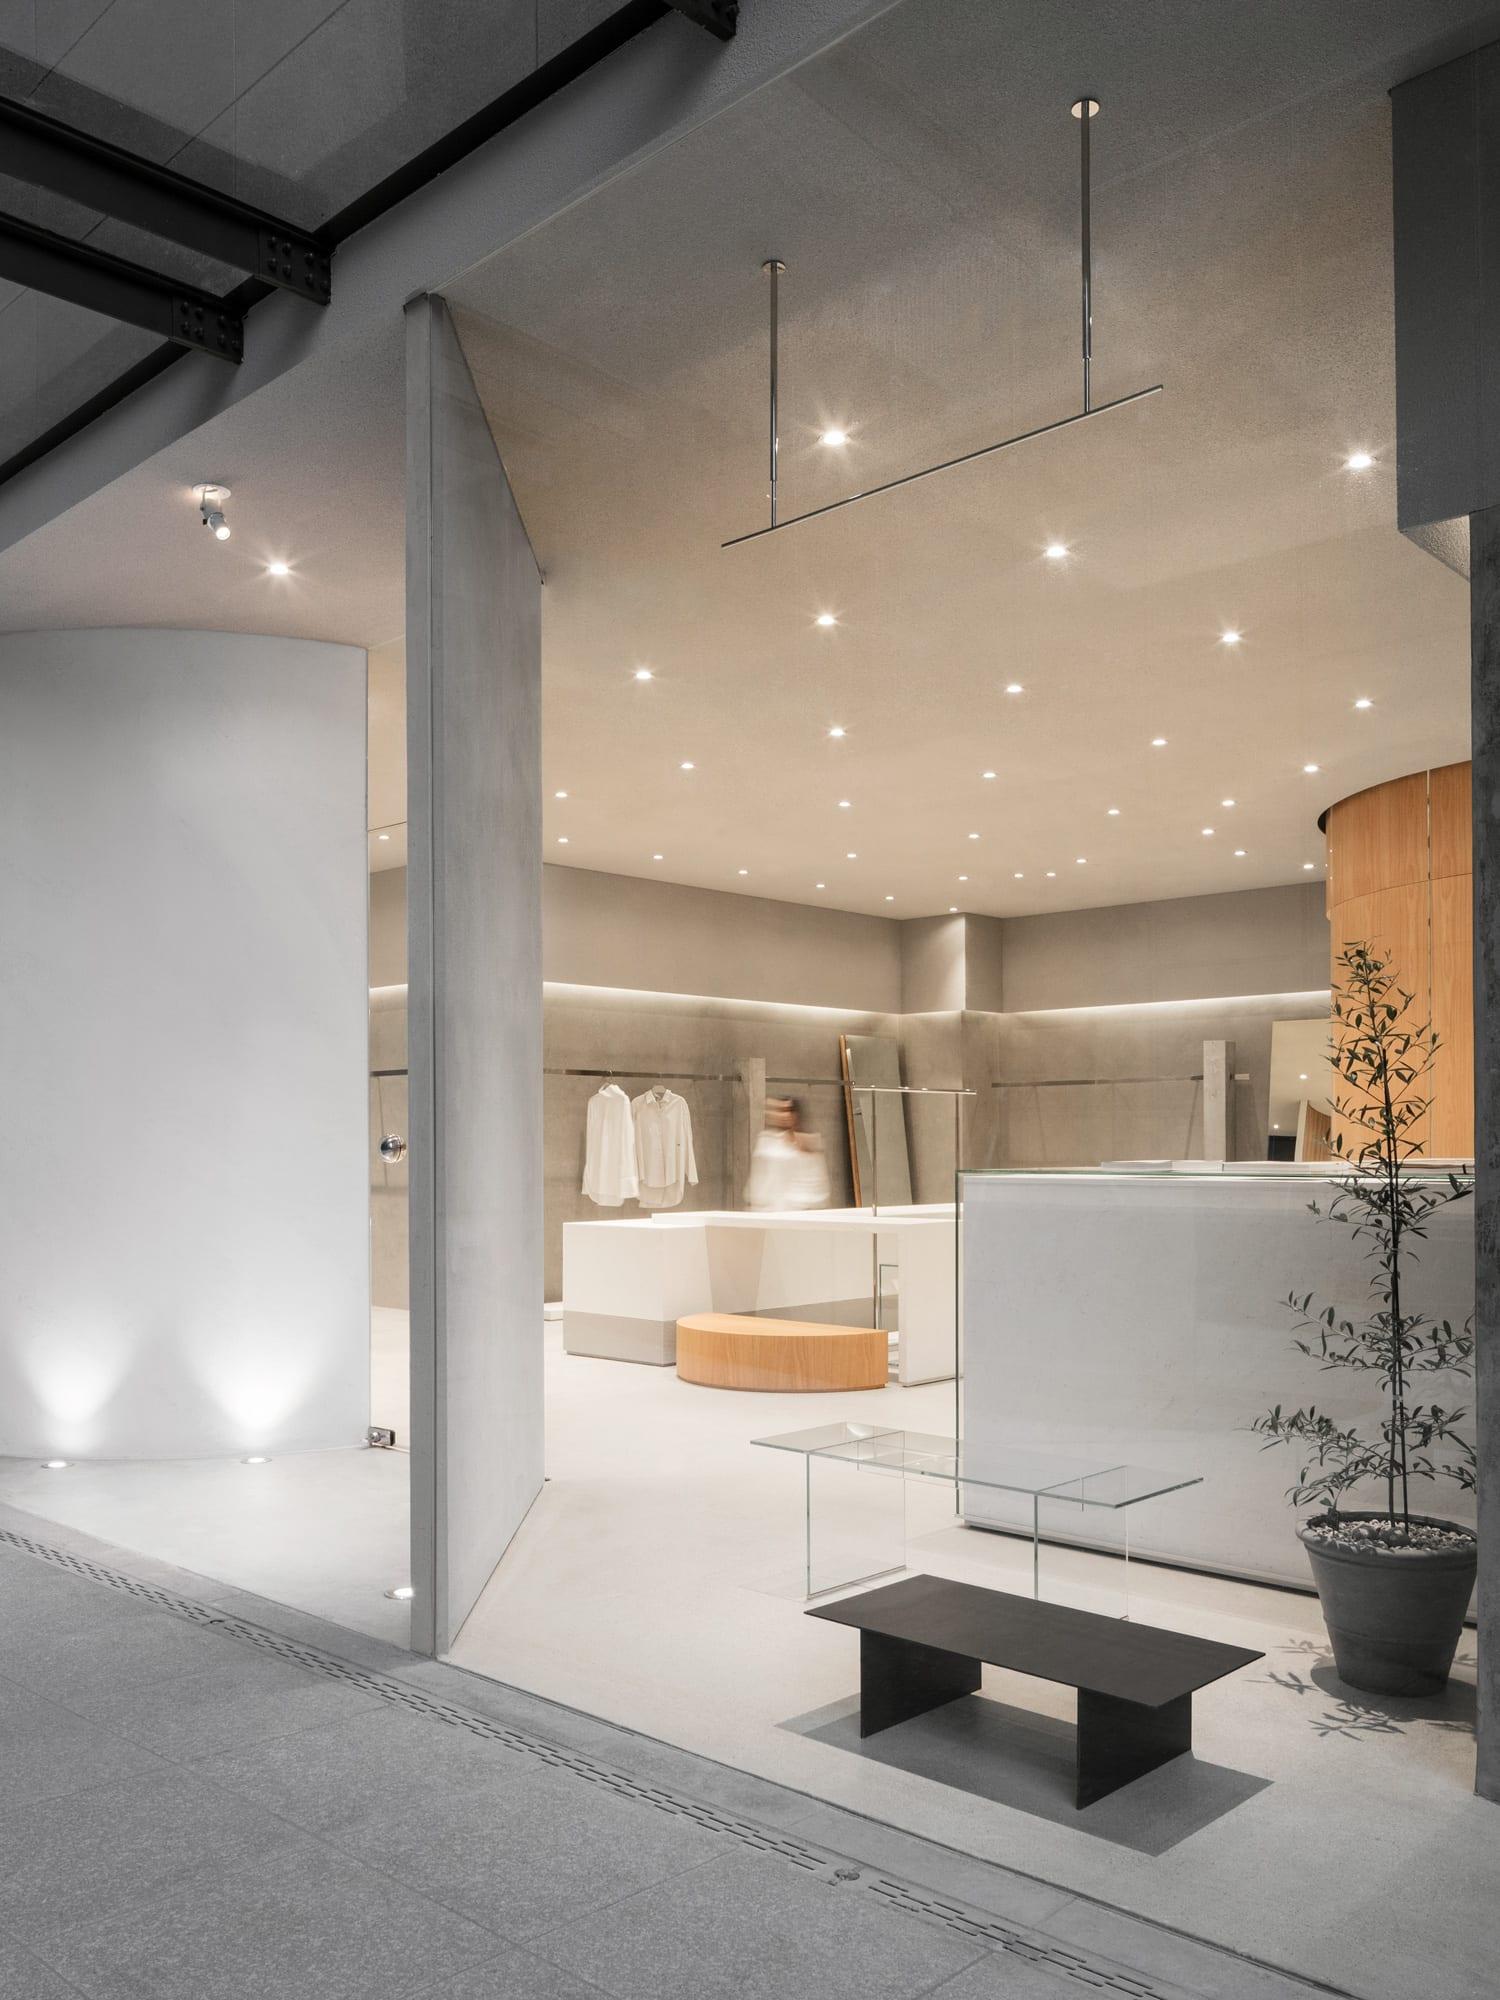 The Ilma Showroom by Studio LABOTORY   Yellowtrace